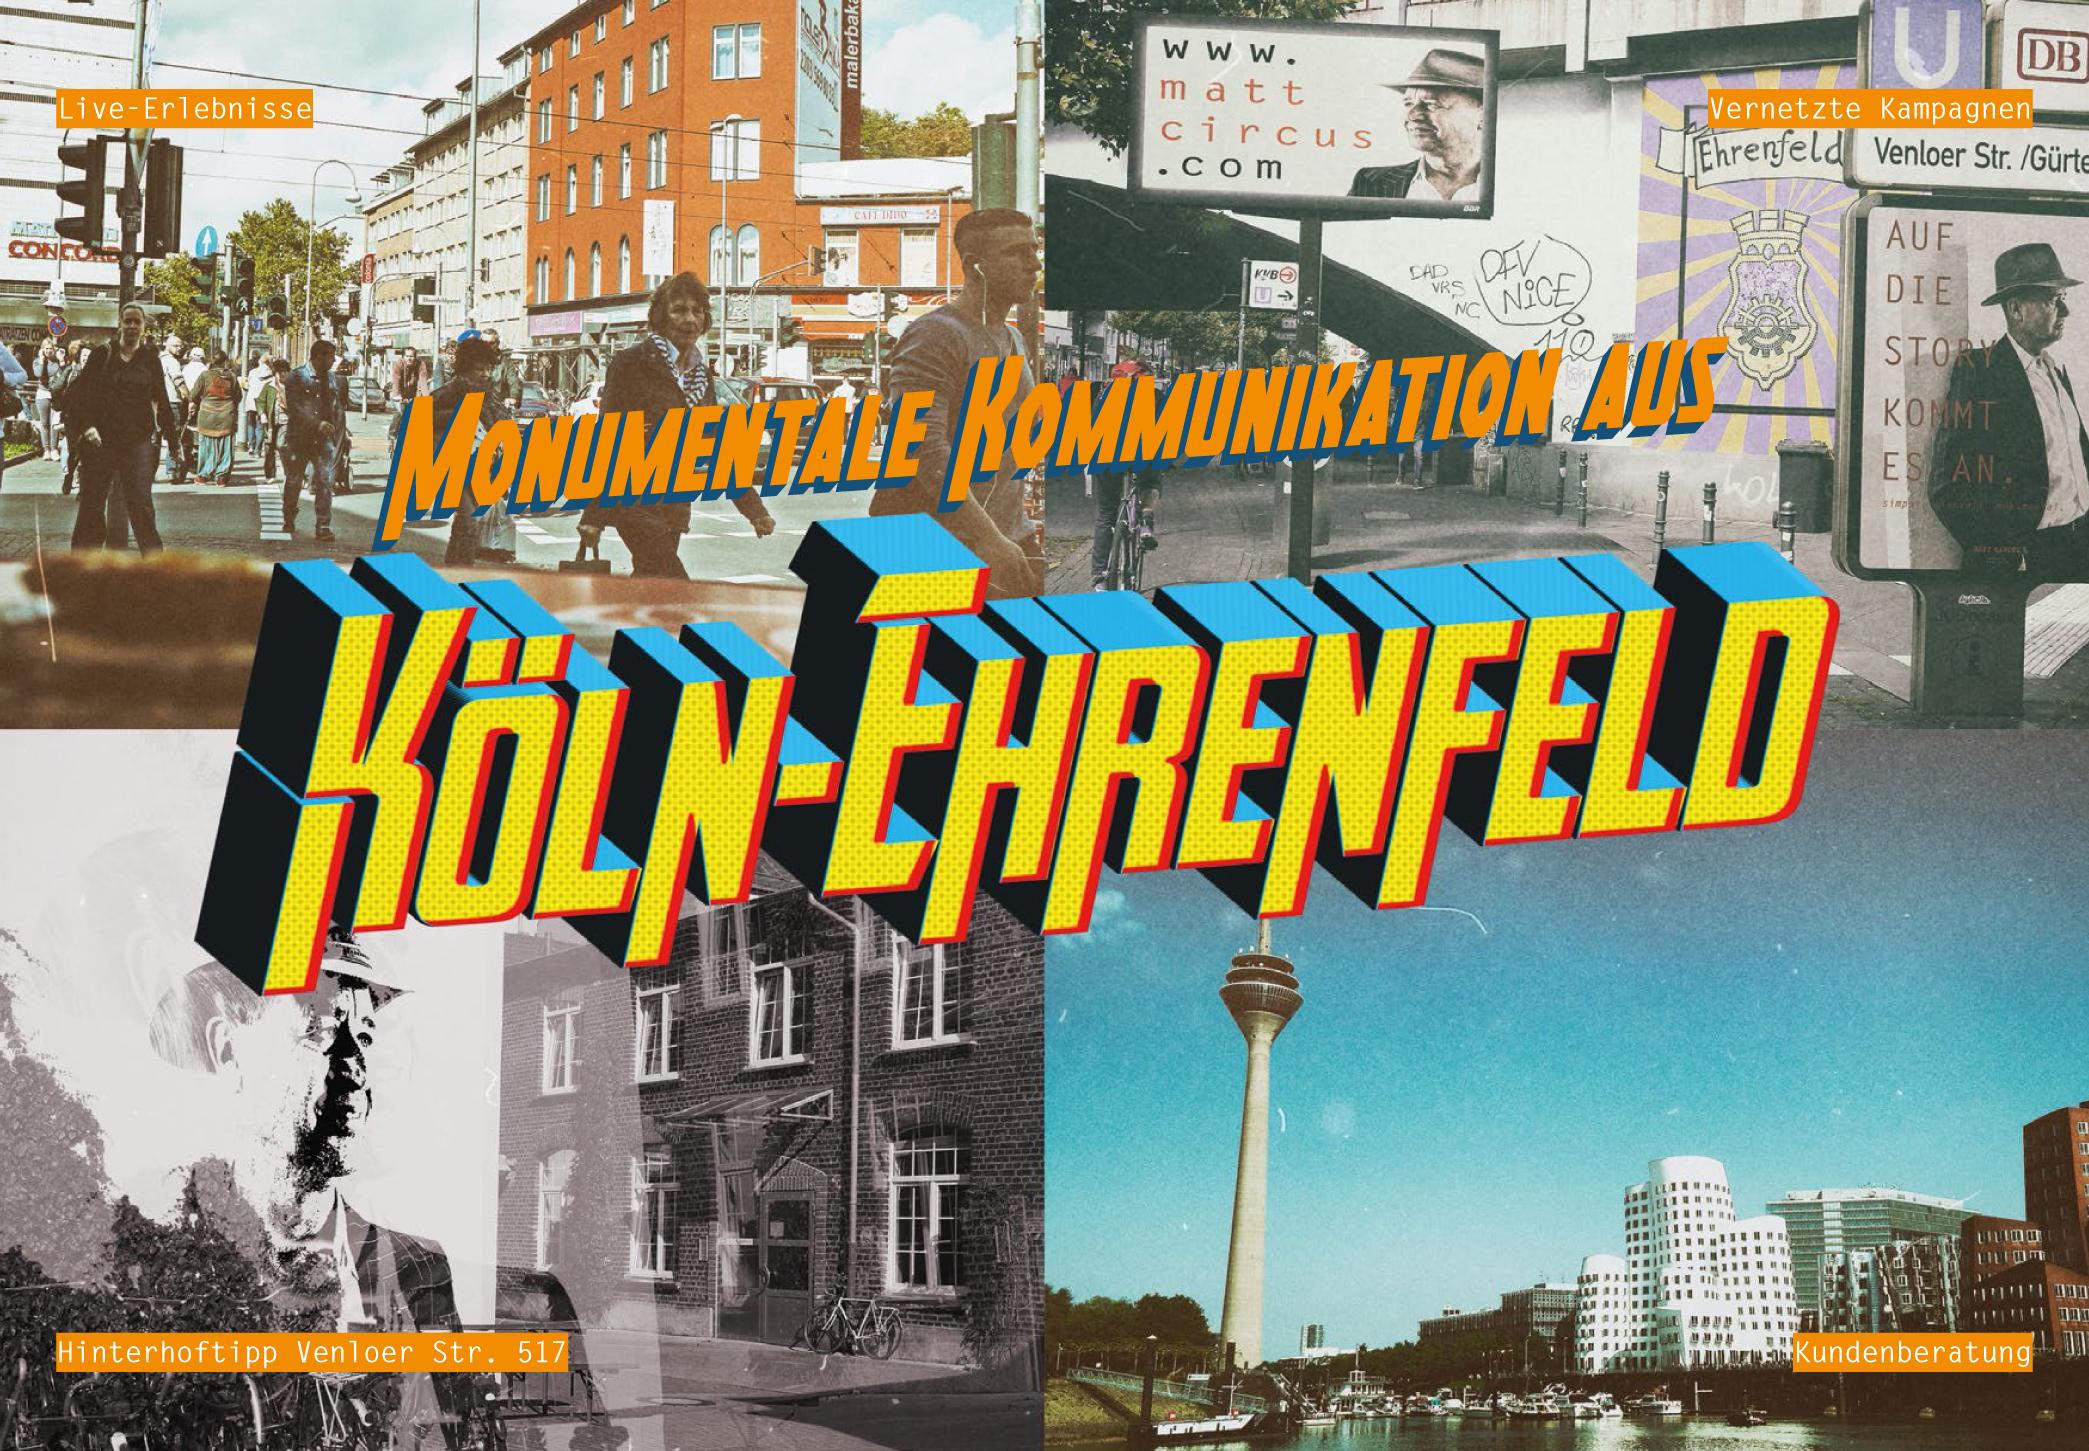 151112_Postkarte_Ehrenfeld.jpg